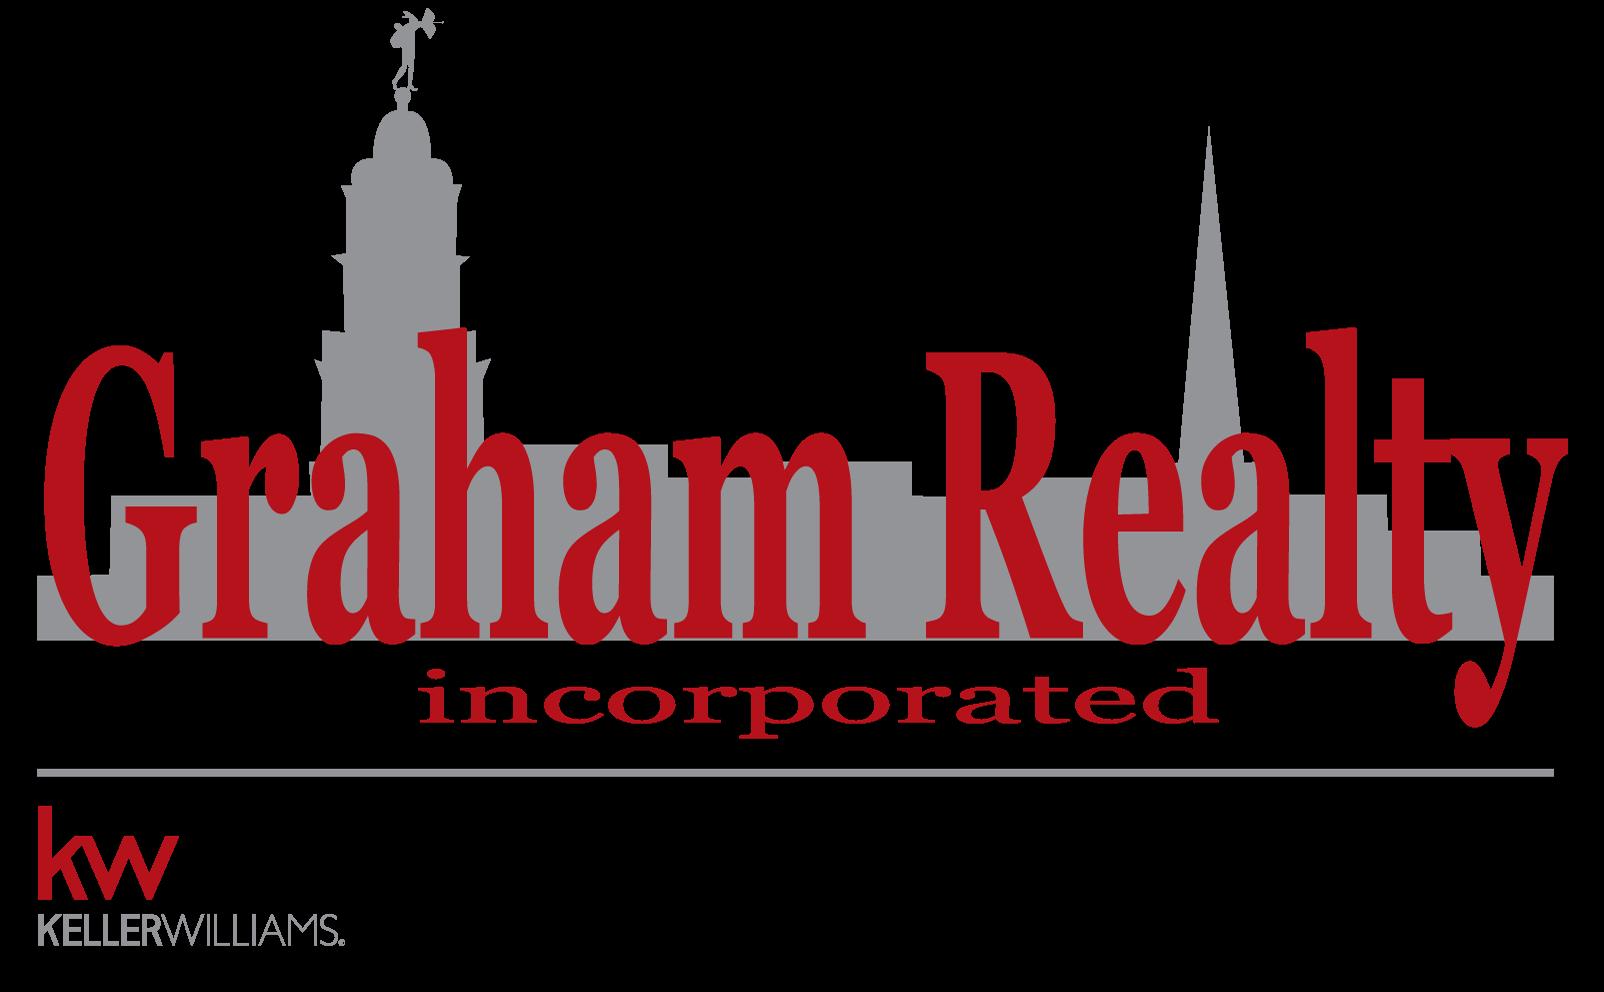 Graham Realty